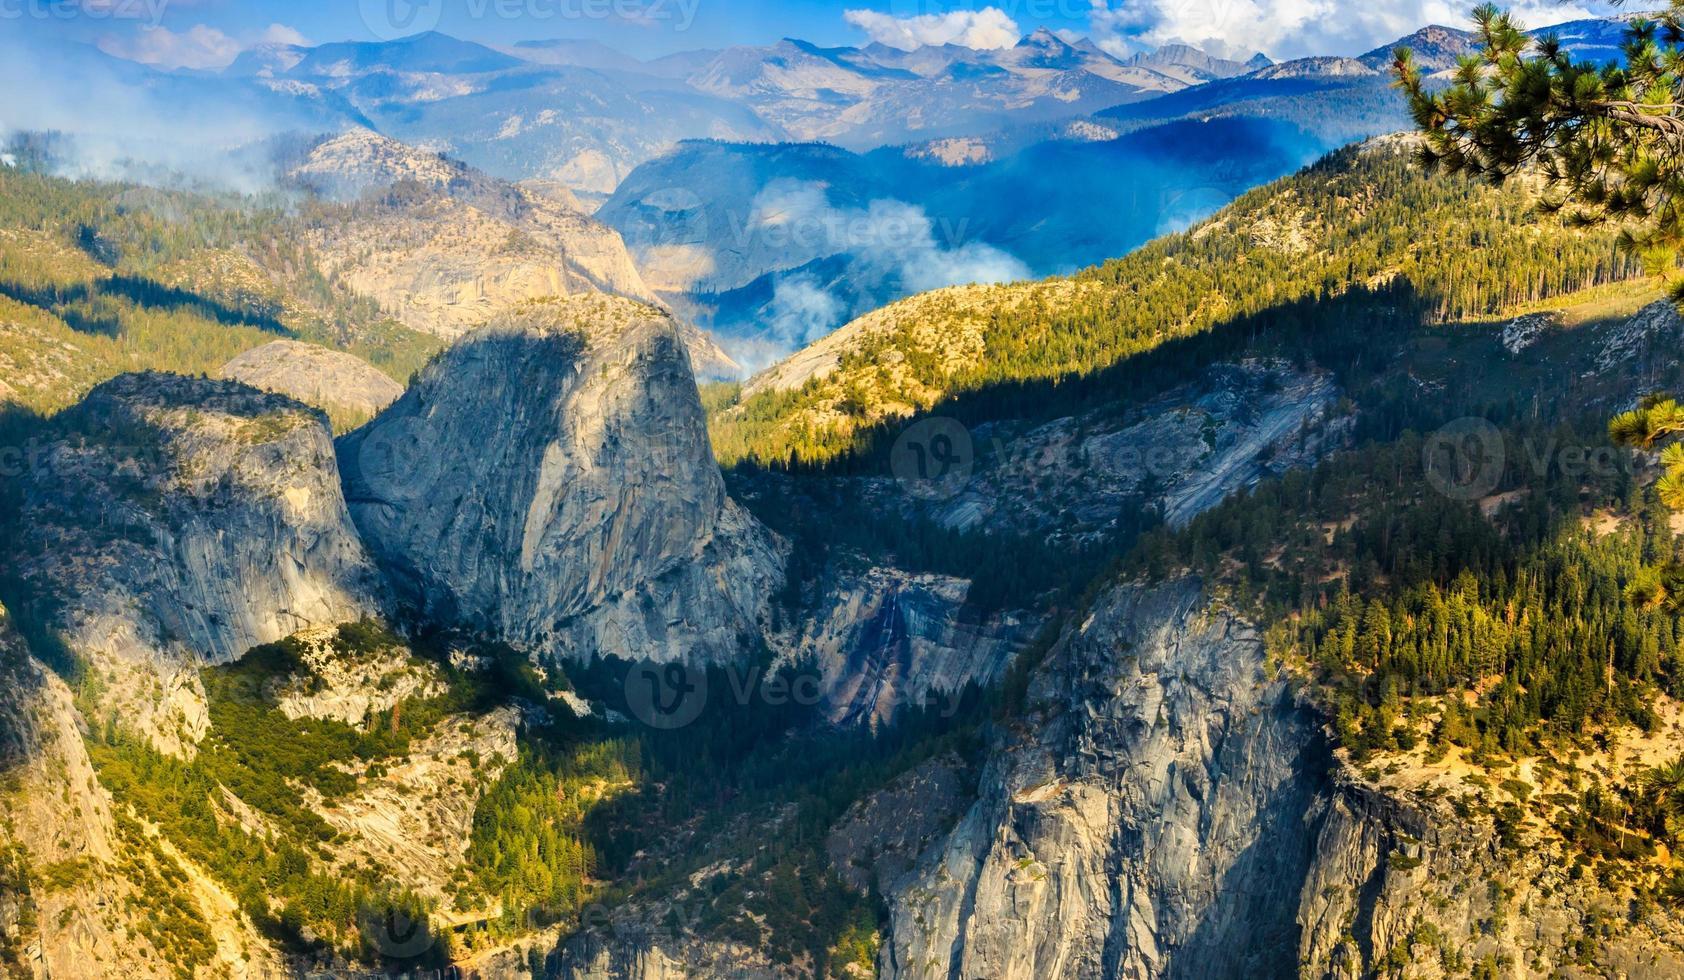 vallée de Yosemite. photo